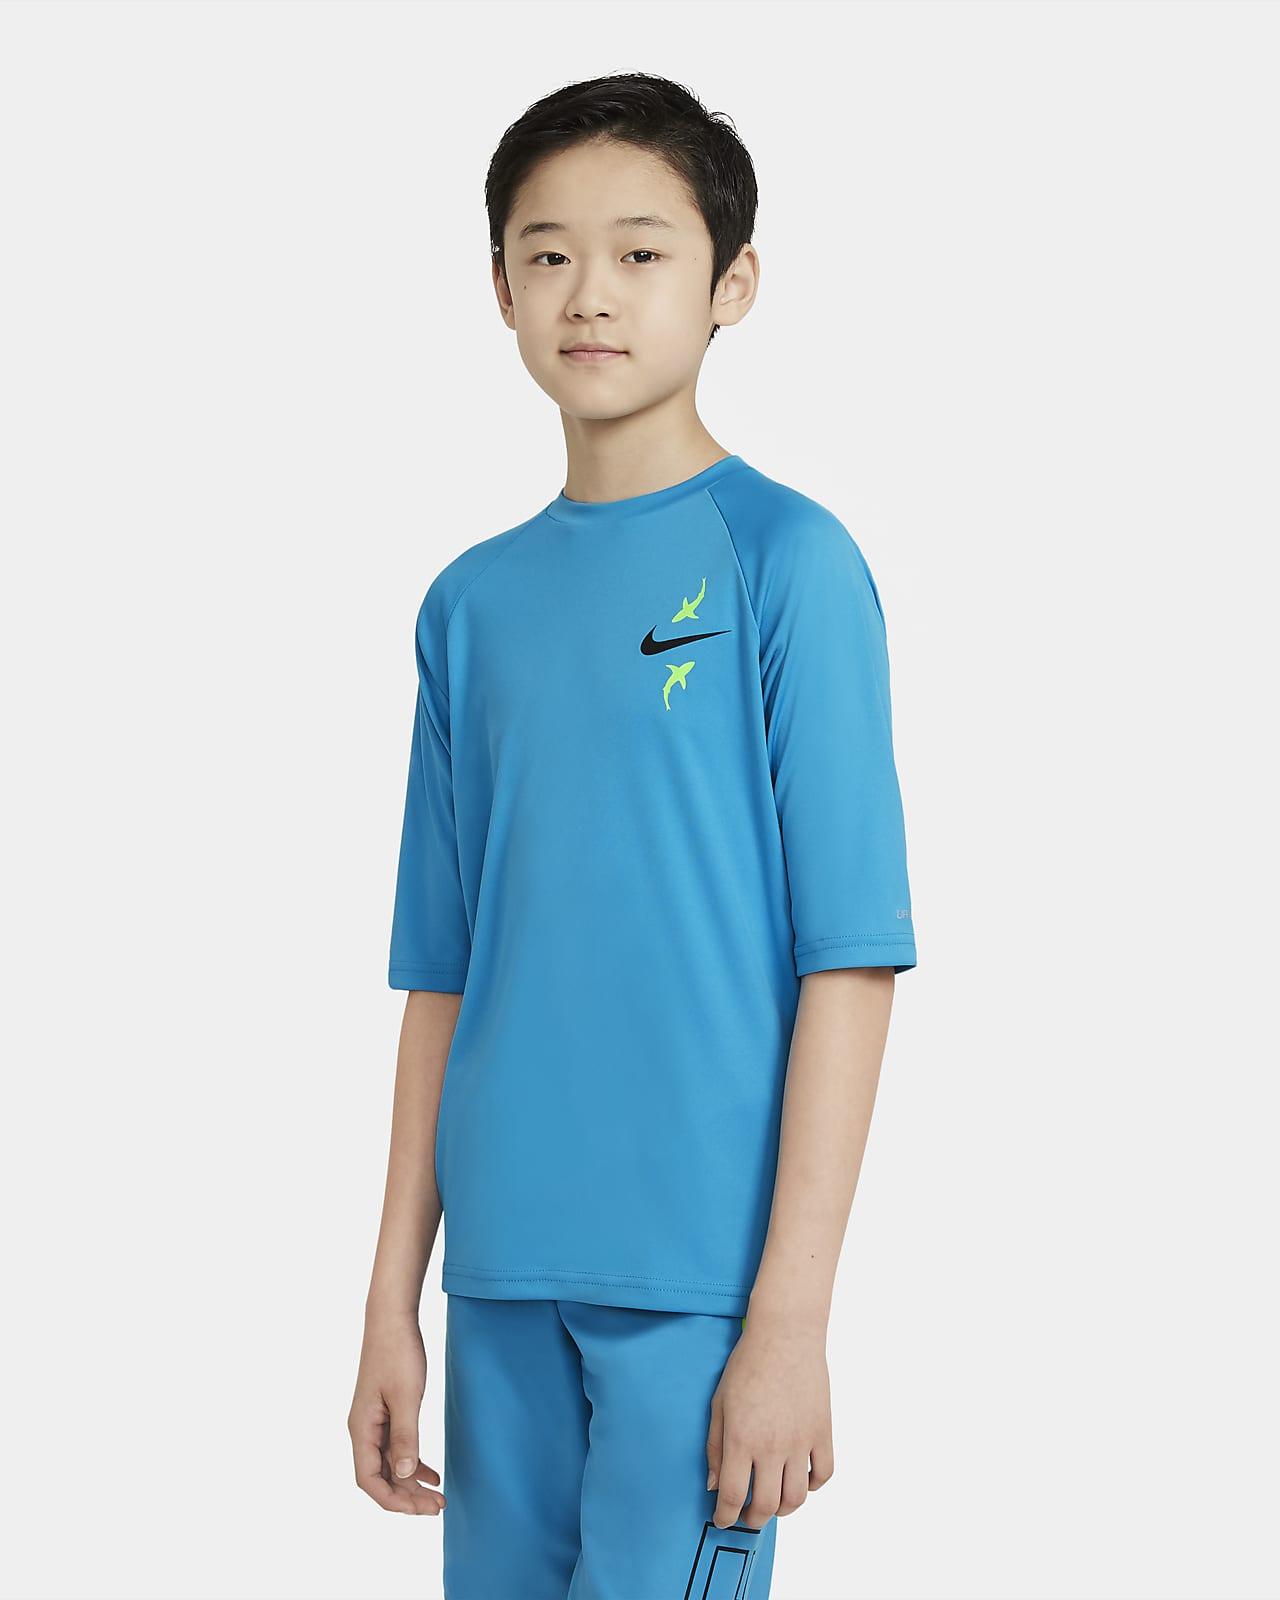 Nike Big Kids' (Boys') Short-Sleeve Hydroguard Swim Shirt